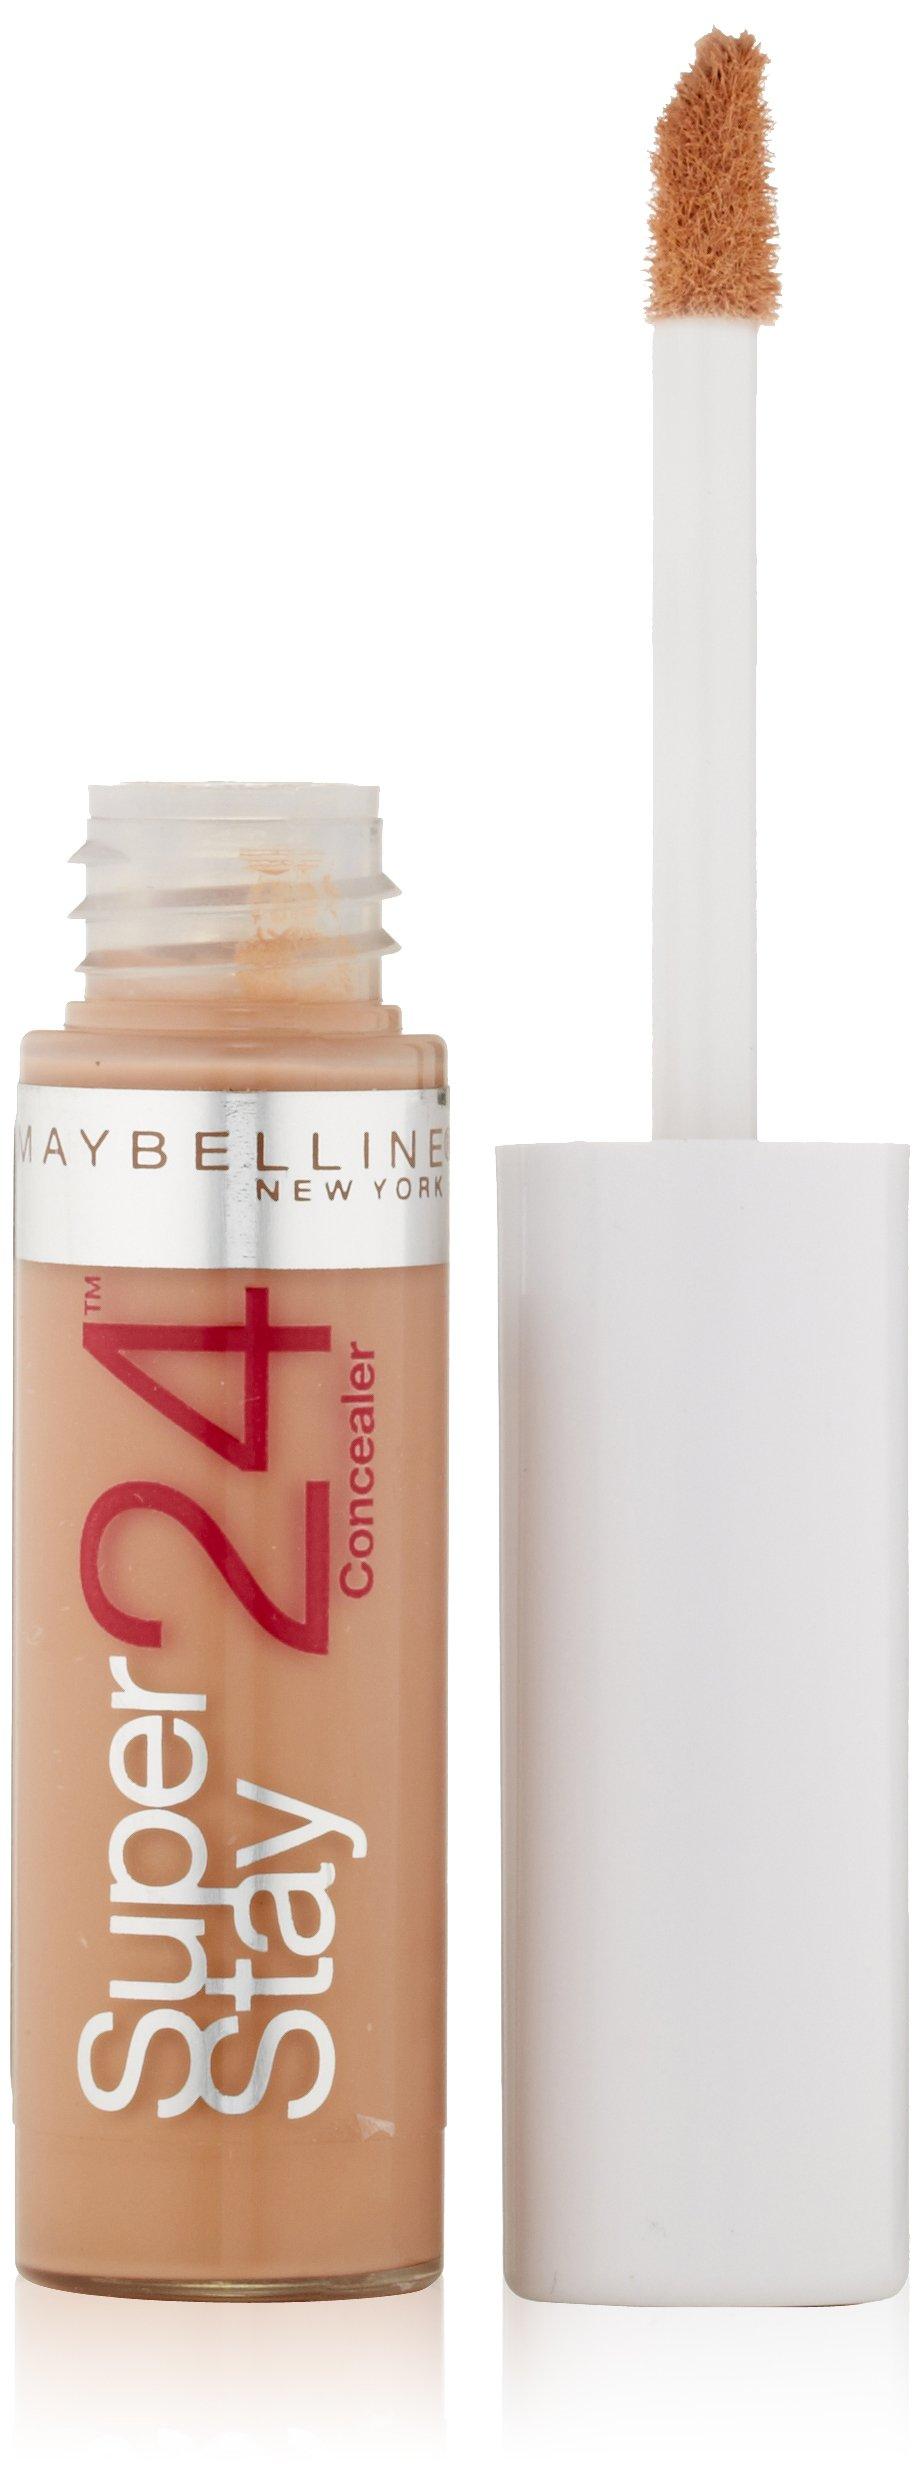 Maybelline New York Super Stay 24Hr Concealer, Medium Beige 740, 0.18 Fluid Ounce